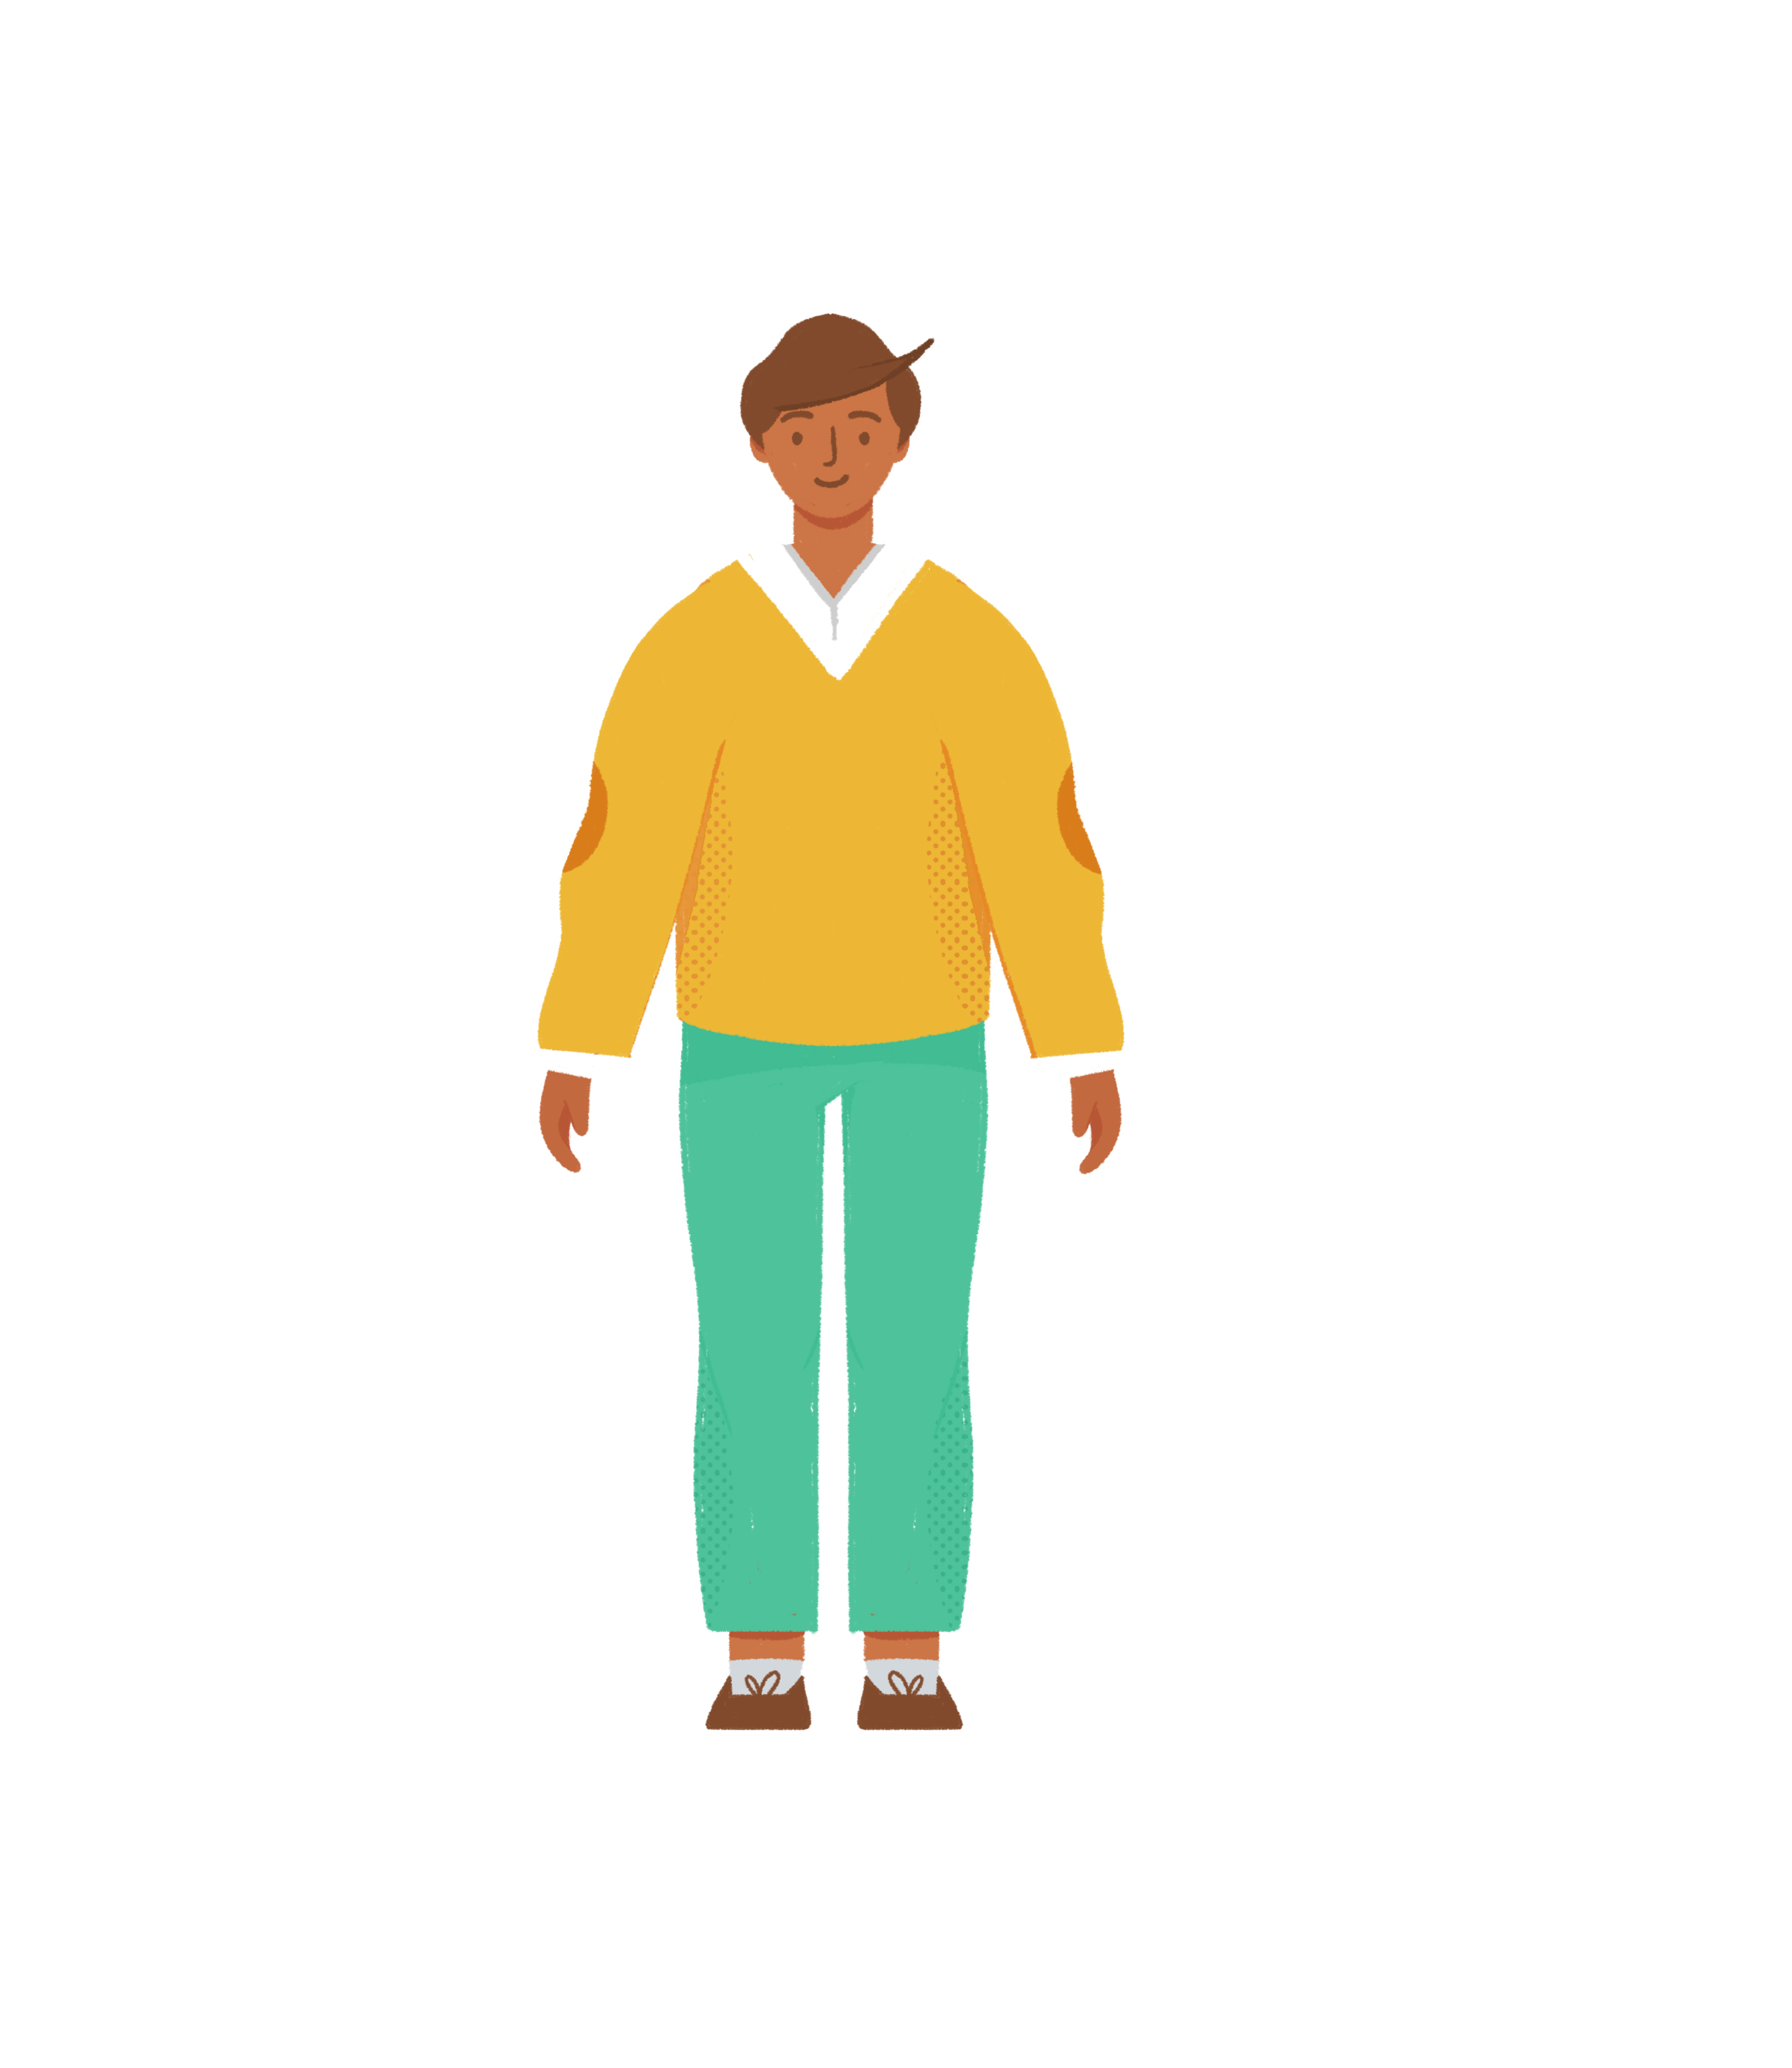 character sheetfront_op1.jpg